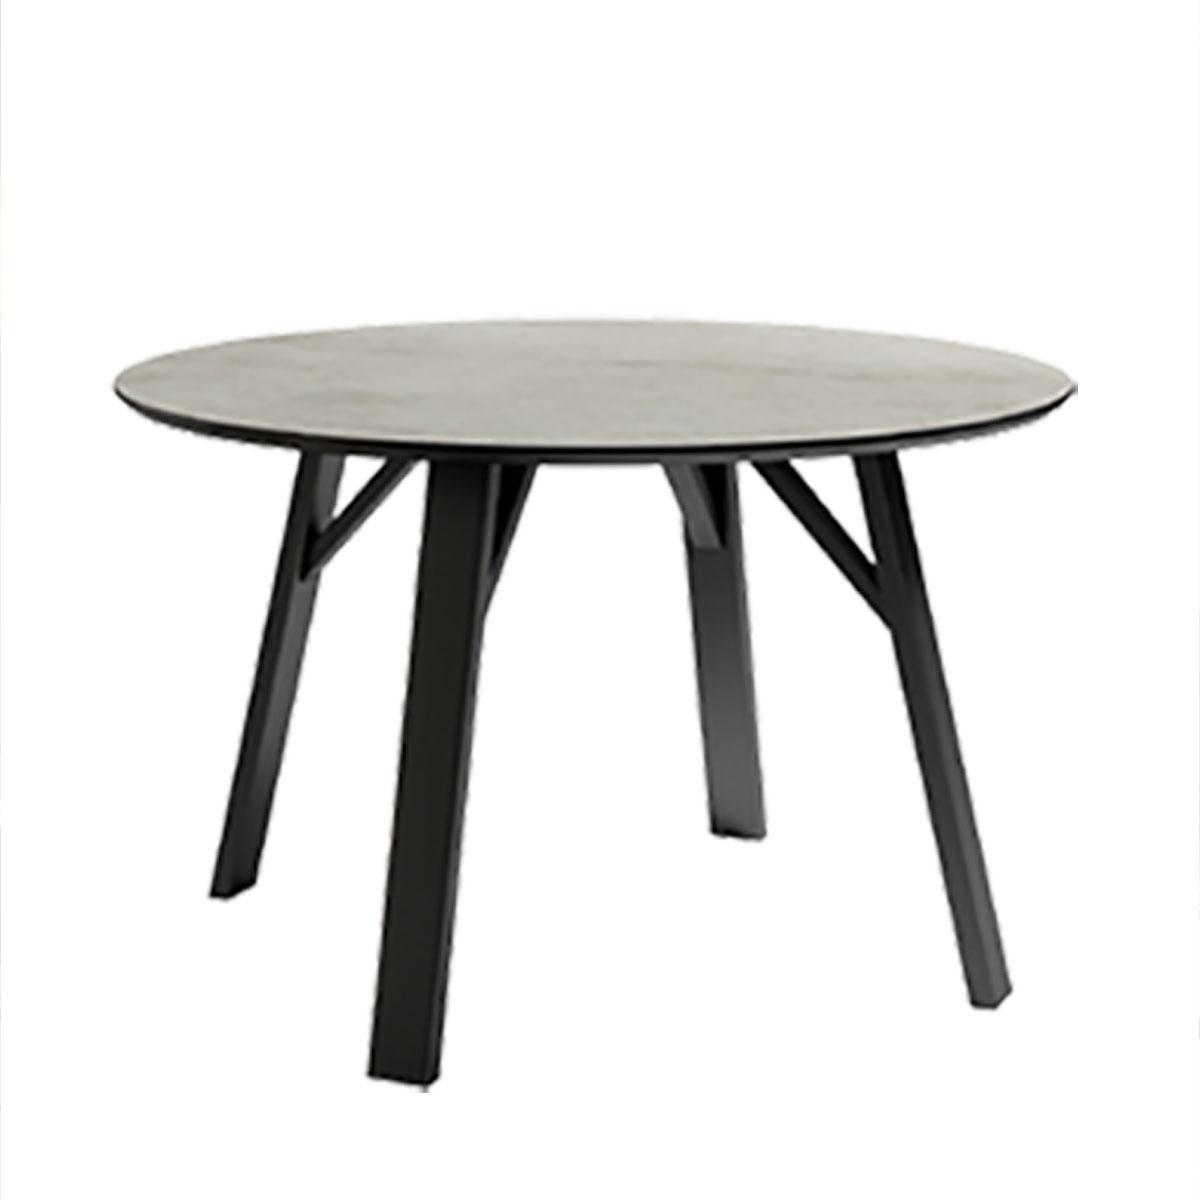 Mesa comedor redonda marmol - Artikalia - Muebles de diseño ...